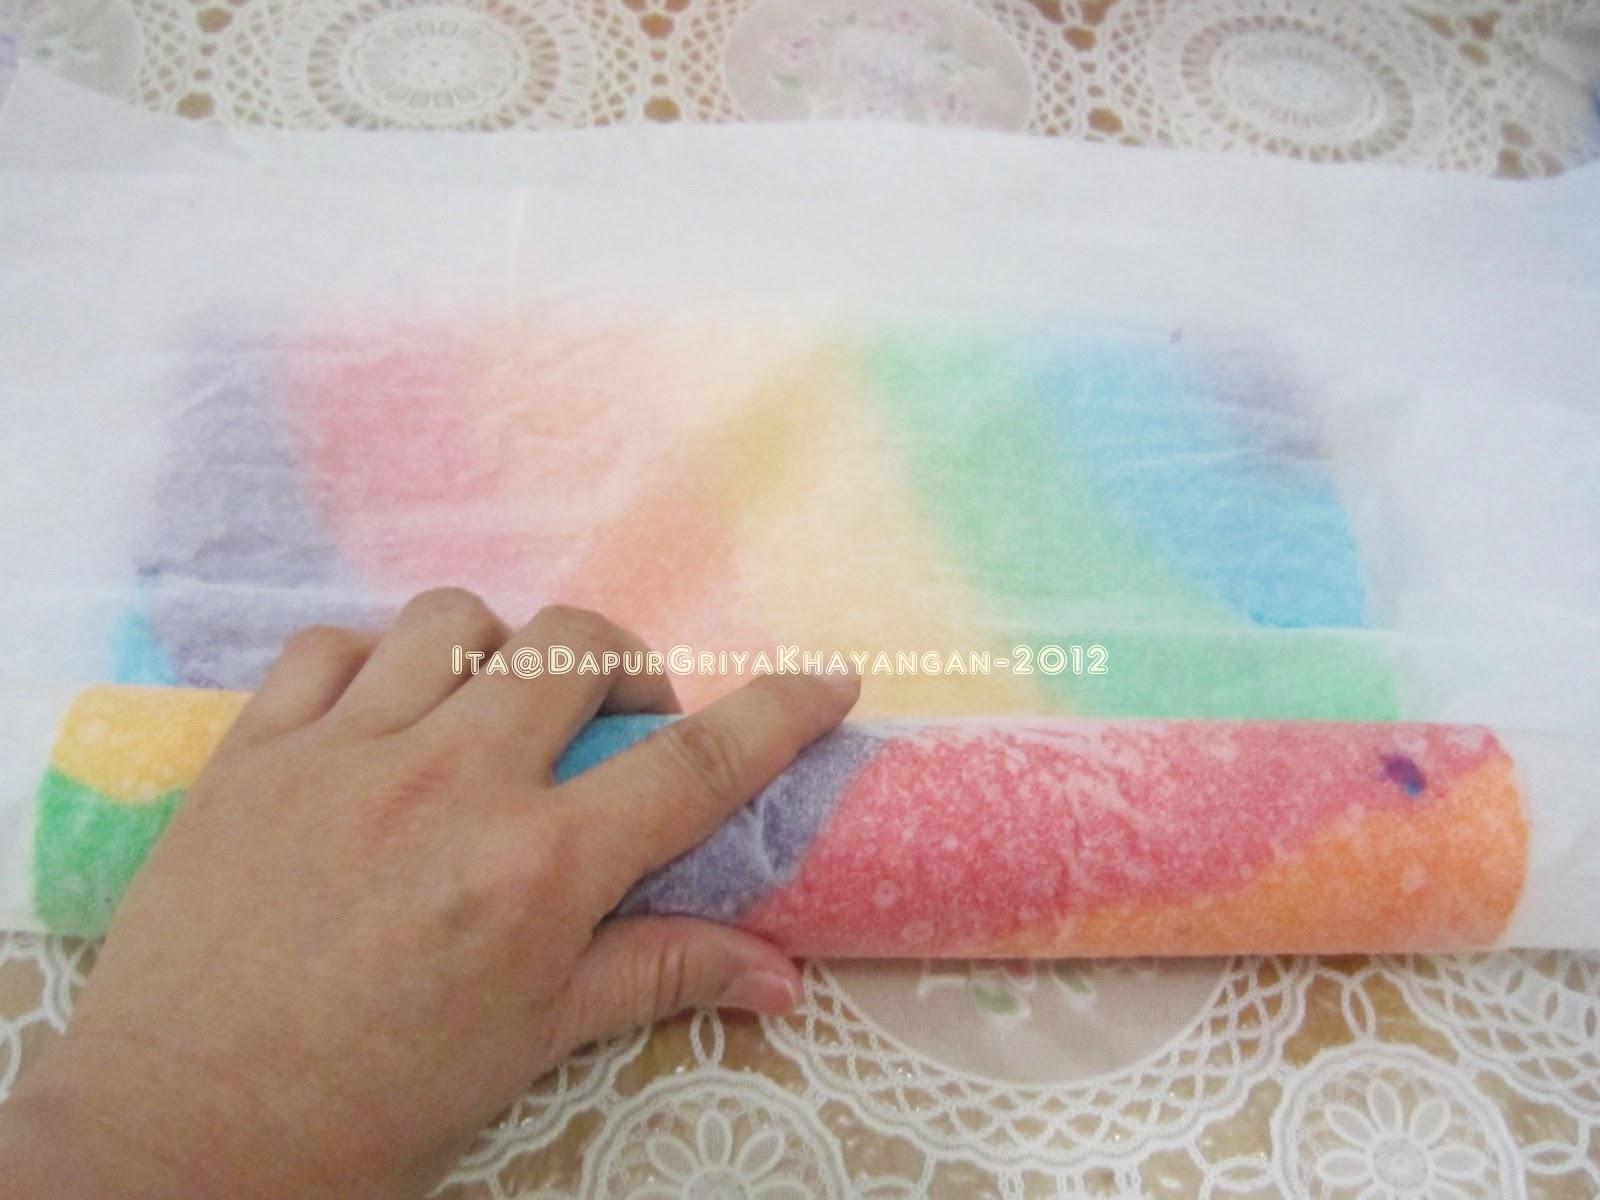 Resep Rainbow Cake Ncc Fatmah Bahalwan: Dapur Griya Khayangan: Bolu Gulung Kukus Rainbow